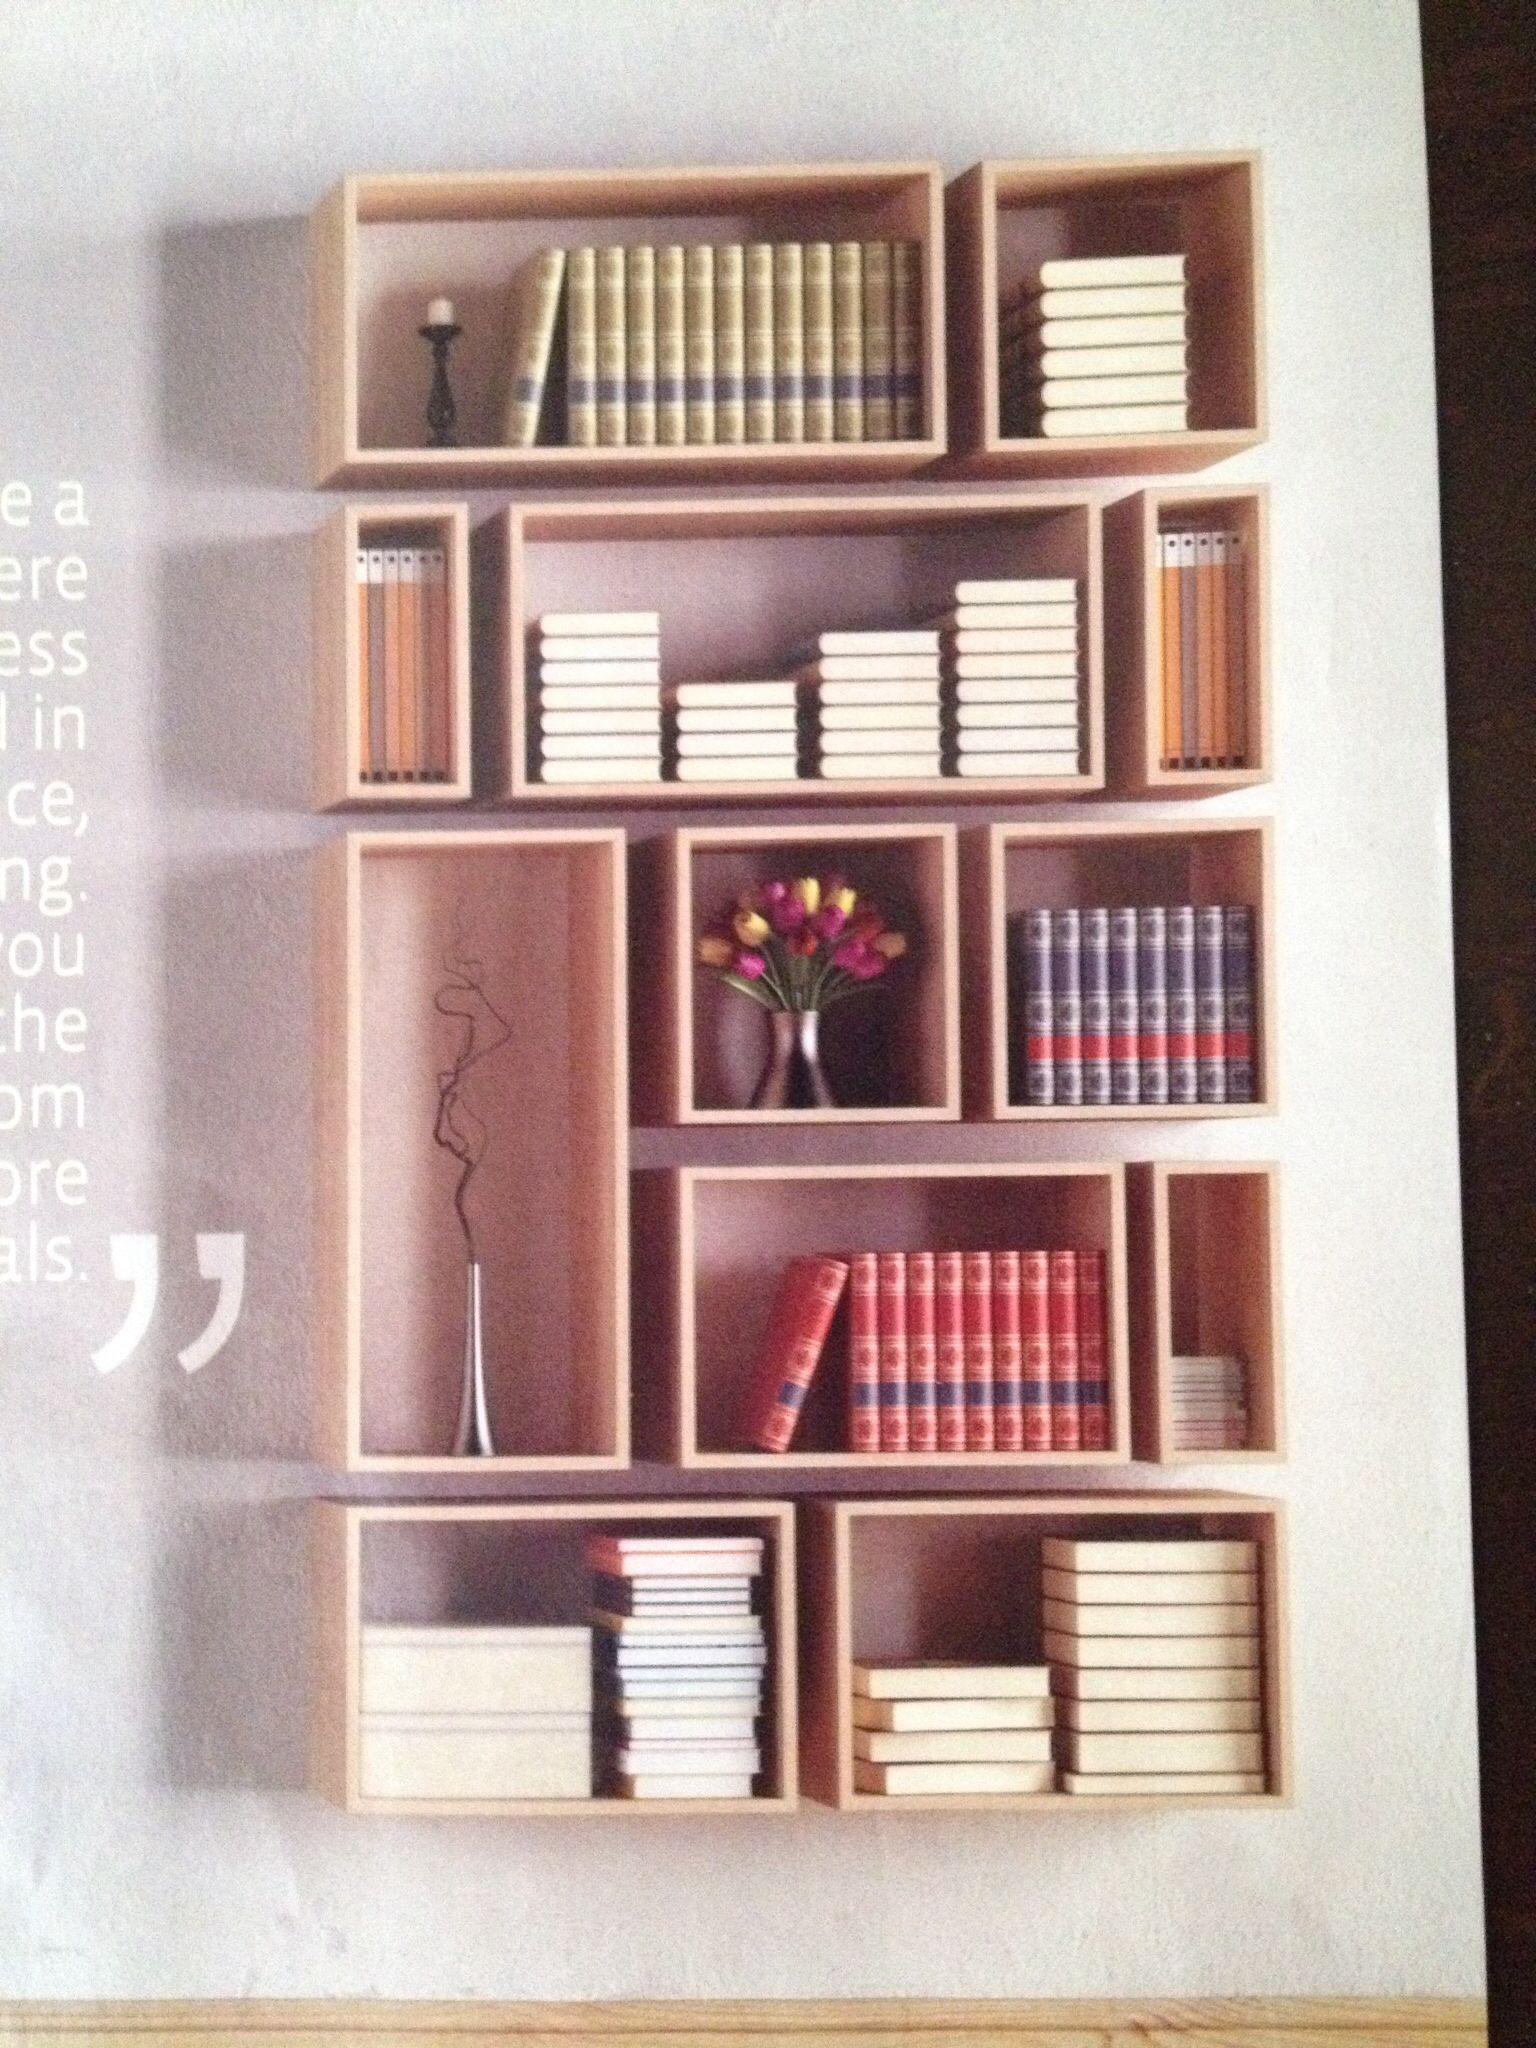 Minimalist shelving basement pinterest libreros - Muebles para libros modernos ...